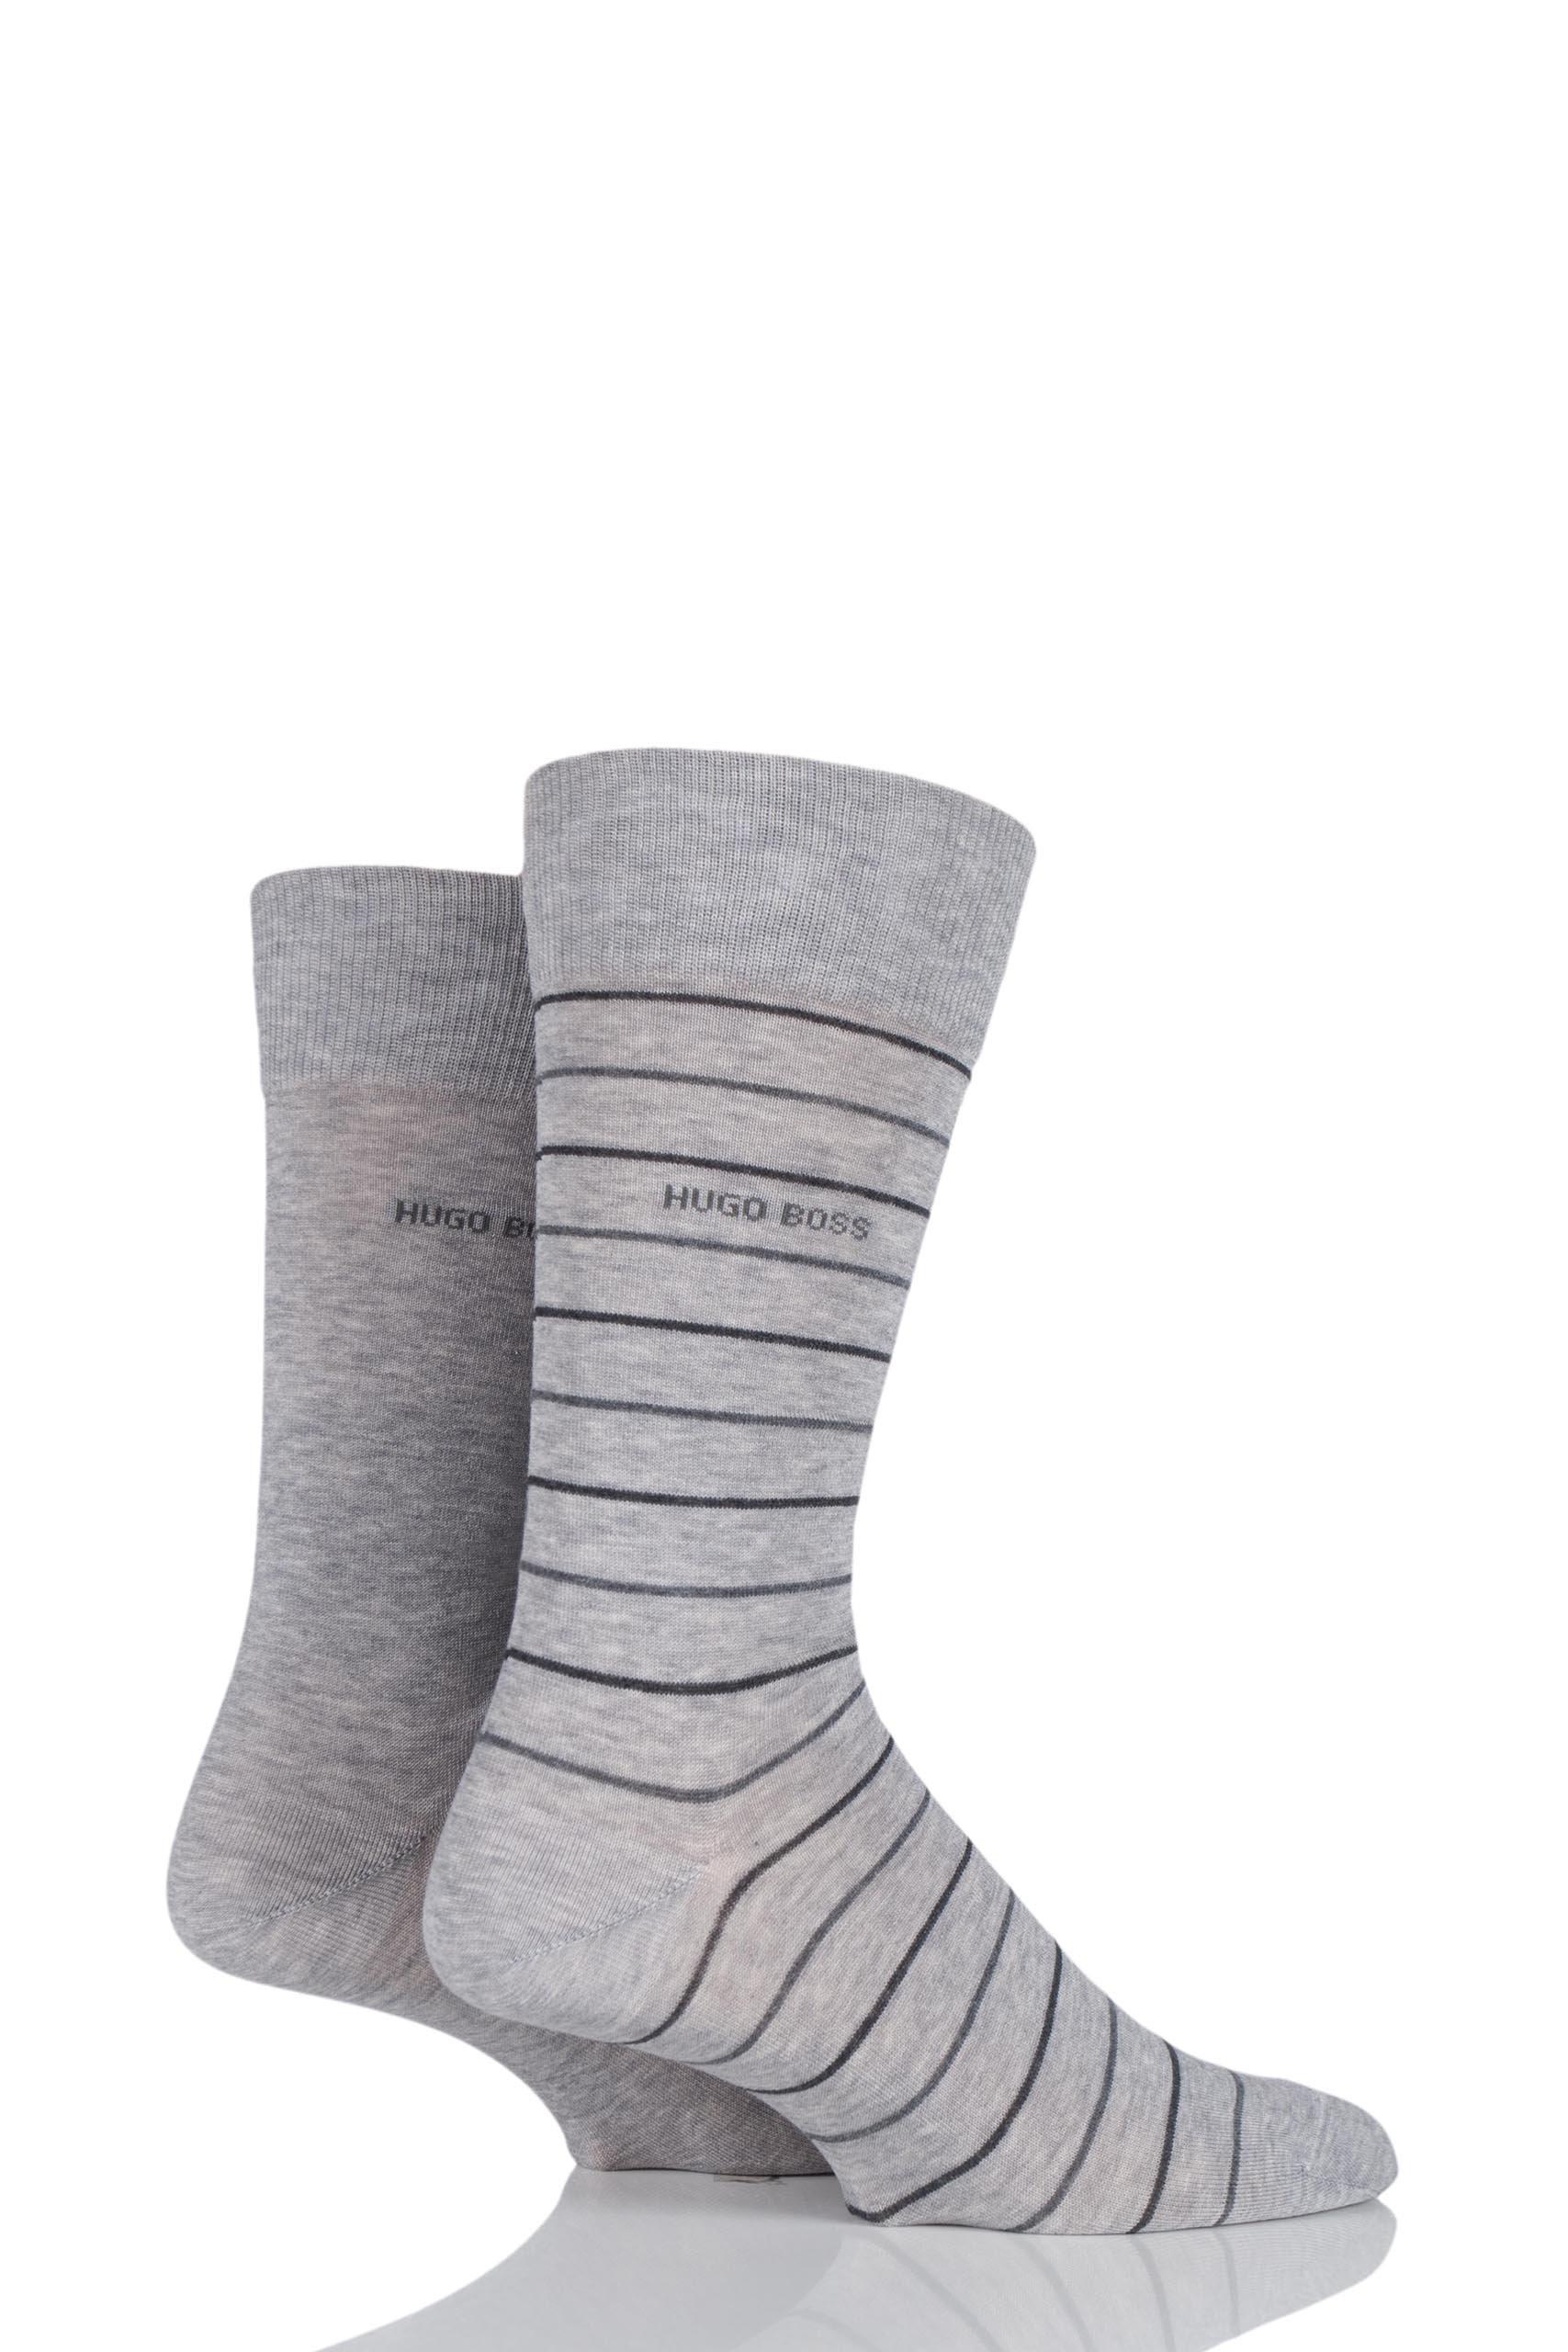 Mens 2 Pair Hugo Boss Fine Striped and Plain Mercerised Cotton Socks Silver 5.5-8